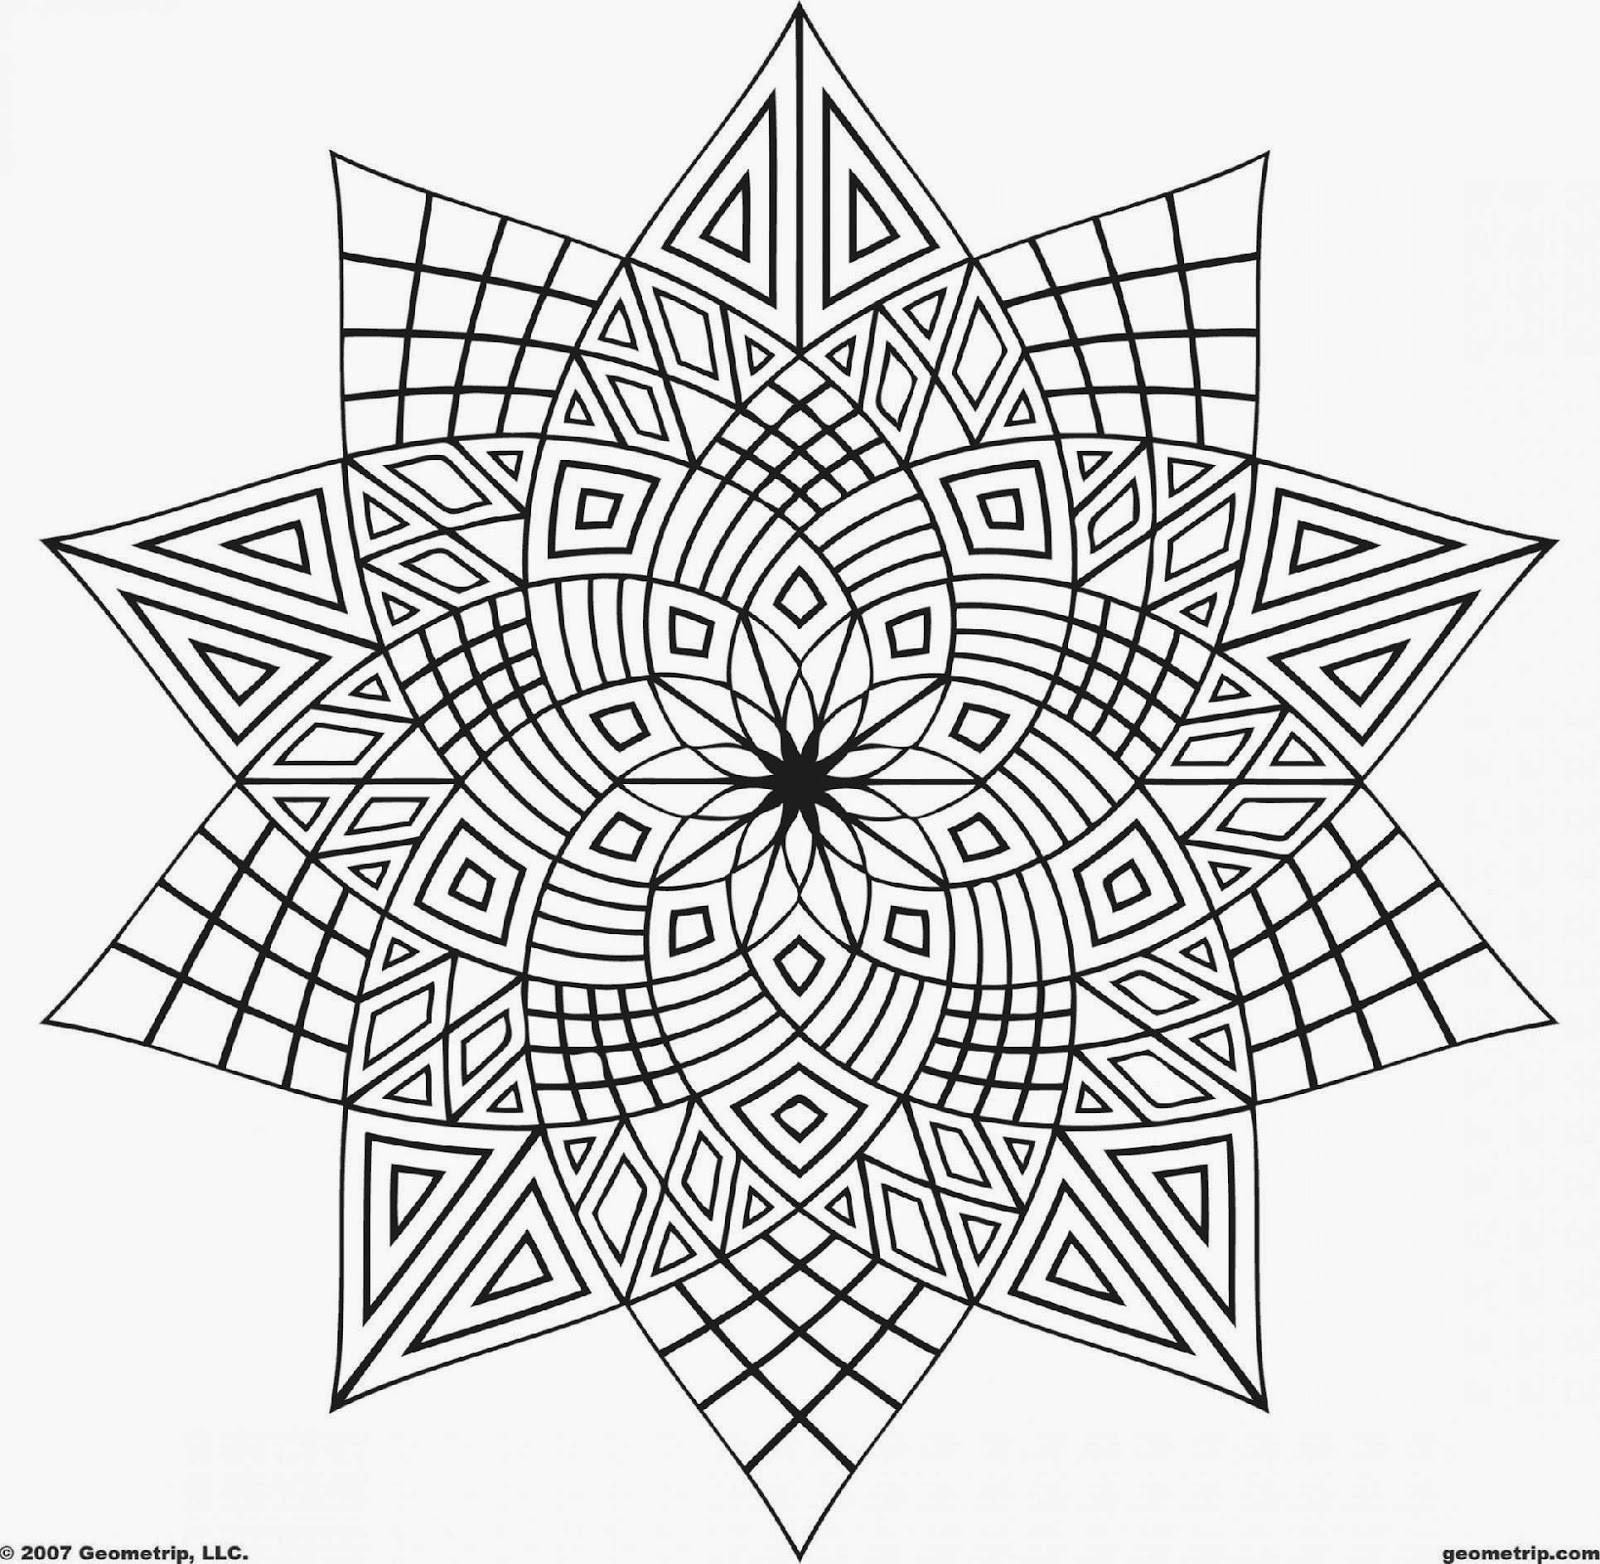 Cool Adult Coloring Pages  Diwali Crafts For Children Pinterest Diwali Diwali